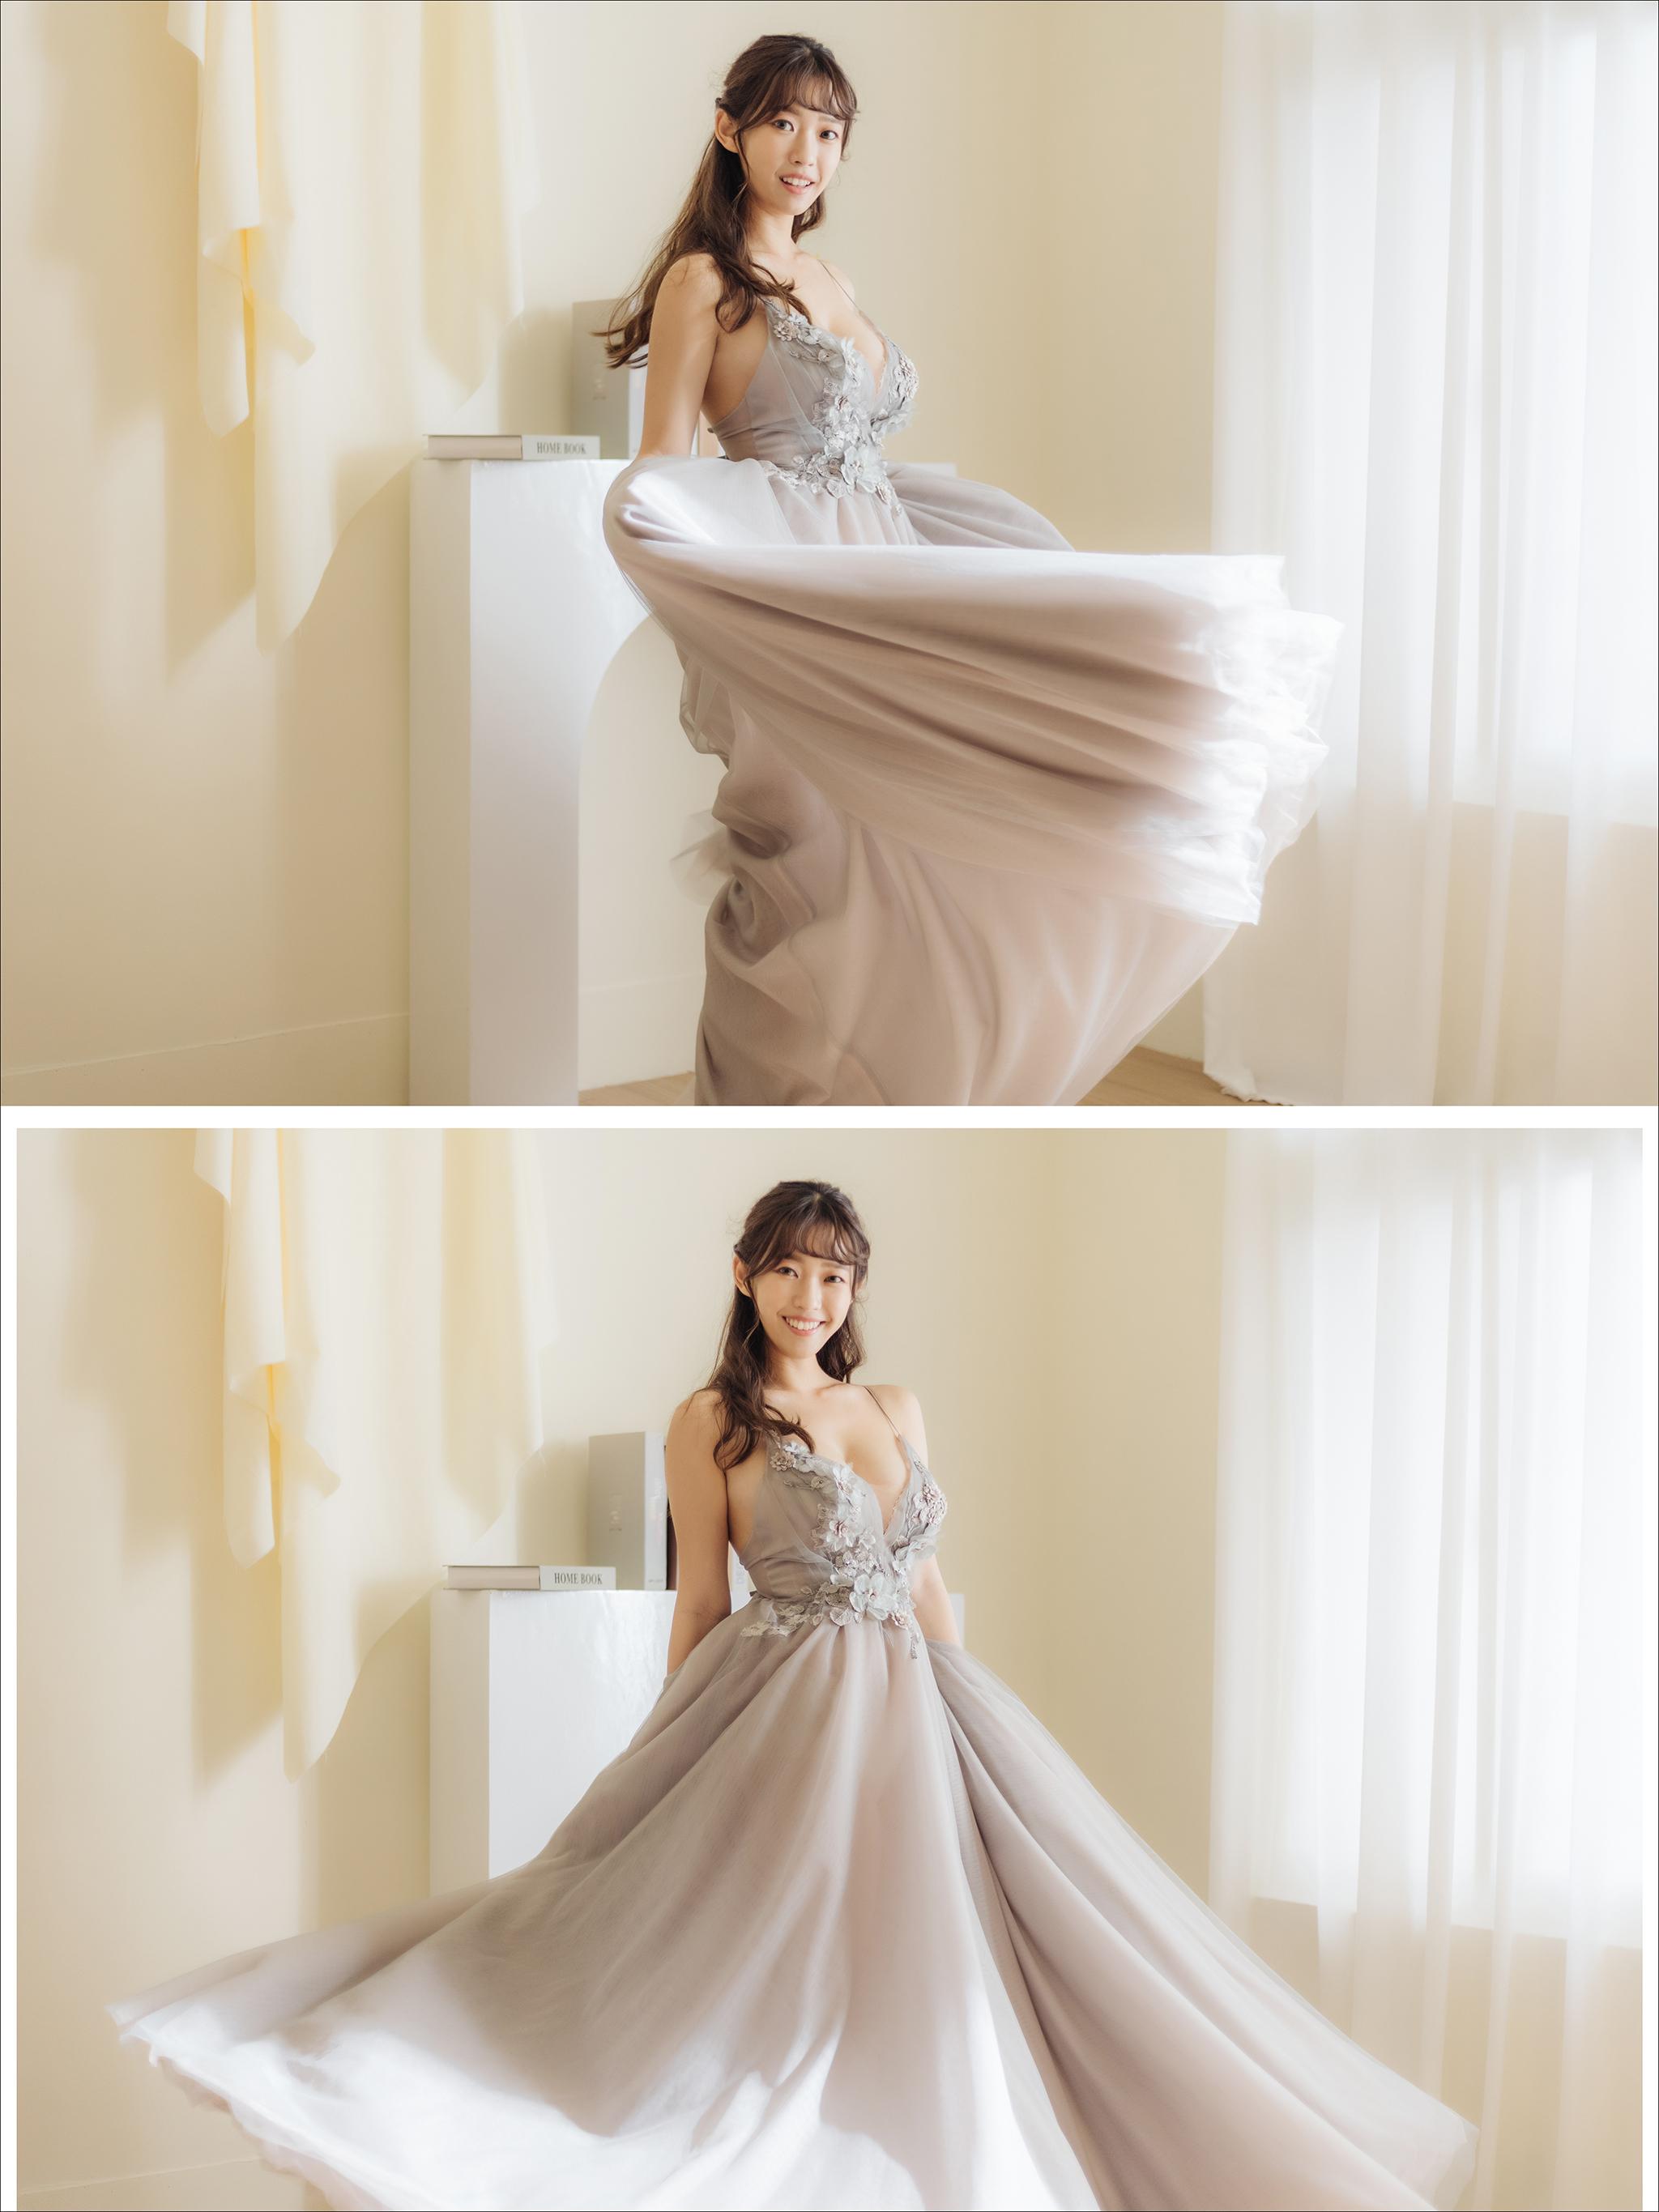 51577452256 6f69f89ed4 o - 【自主婚紗】+江jiang+